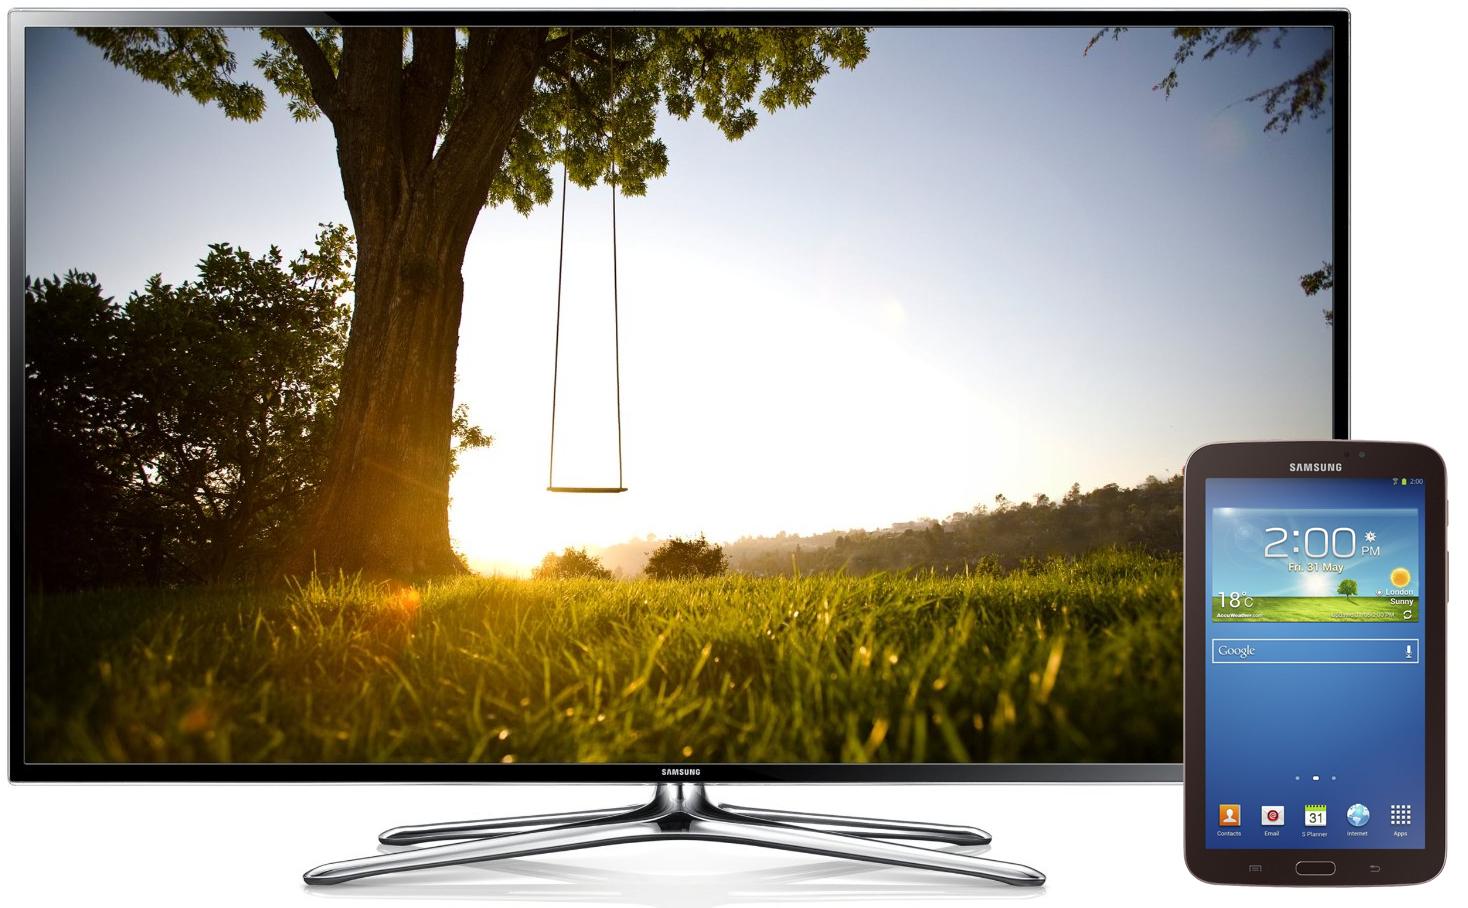 "TV 3D 55"" Samsung 55F6400 Full HD, Smart TV + Tablette Samsung Galaxy Tab 3 7"" 8 Go"